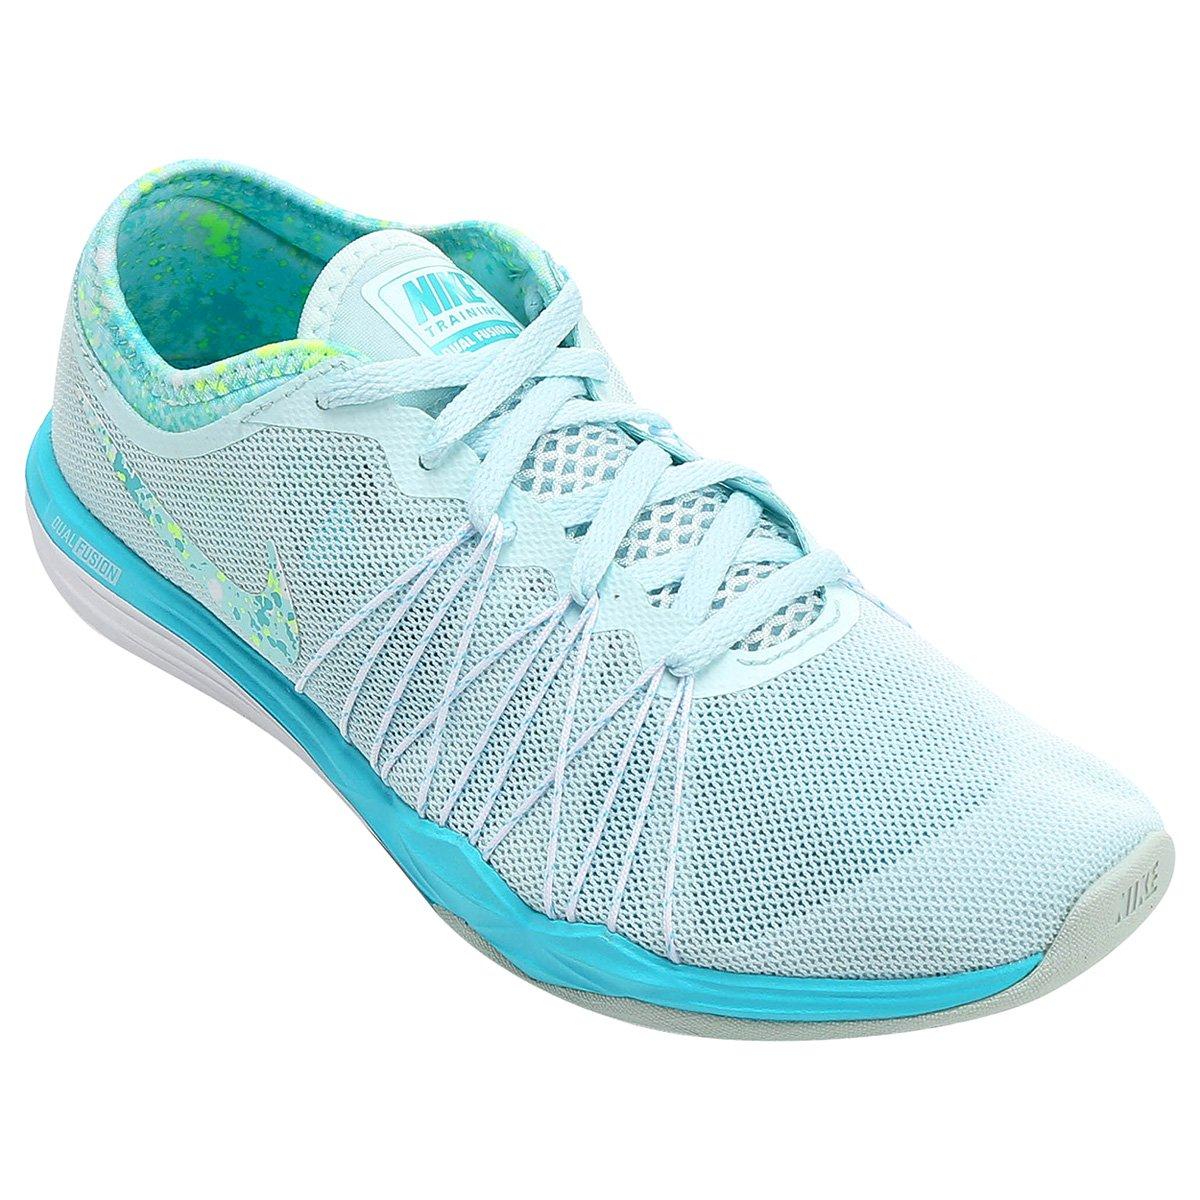 Tênis Nike Dual Fusion Hit Print Training Feminino - Compre Agora ... 0b301eb2d5936